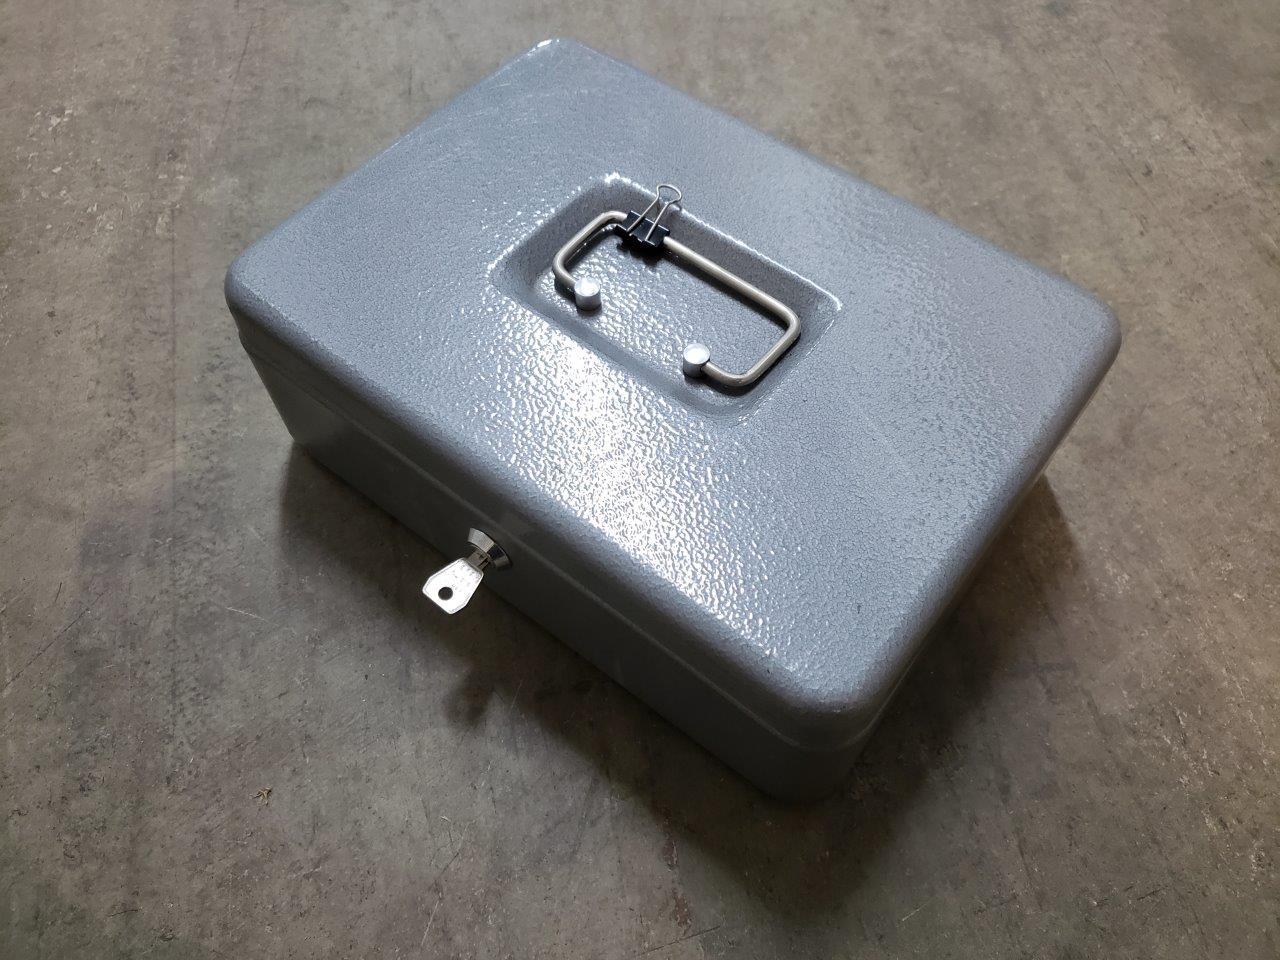 Cash Security Box - Gray, 11 13/16in.W x 9 7/16in.D x 3 3/16in.H